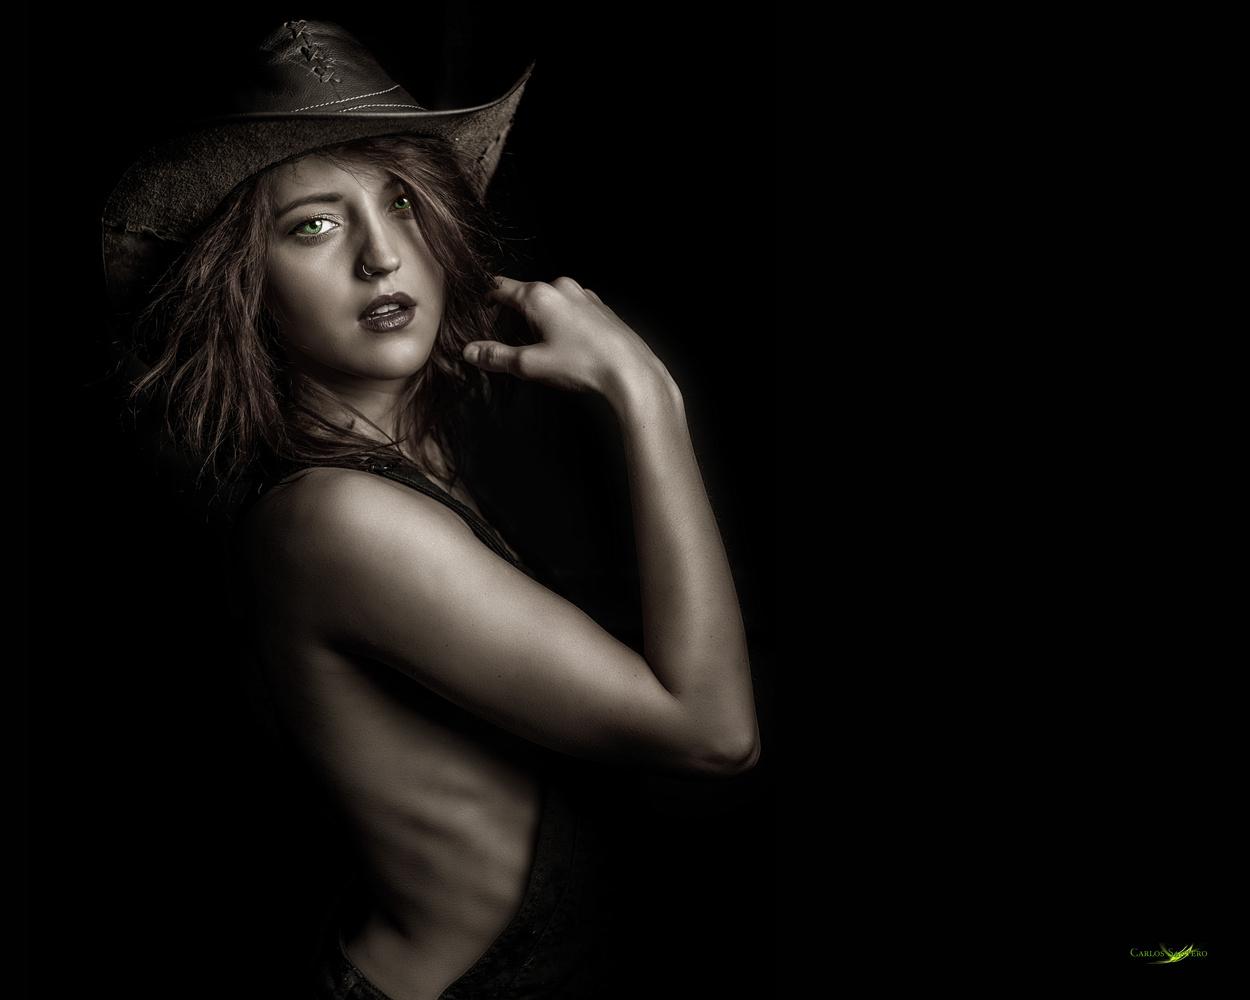 Sex Cowgirl by Carlos Santero